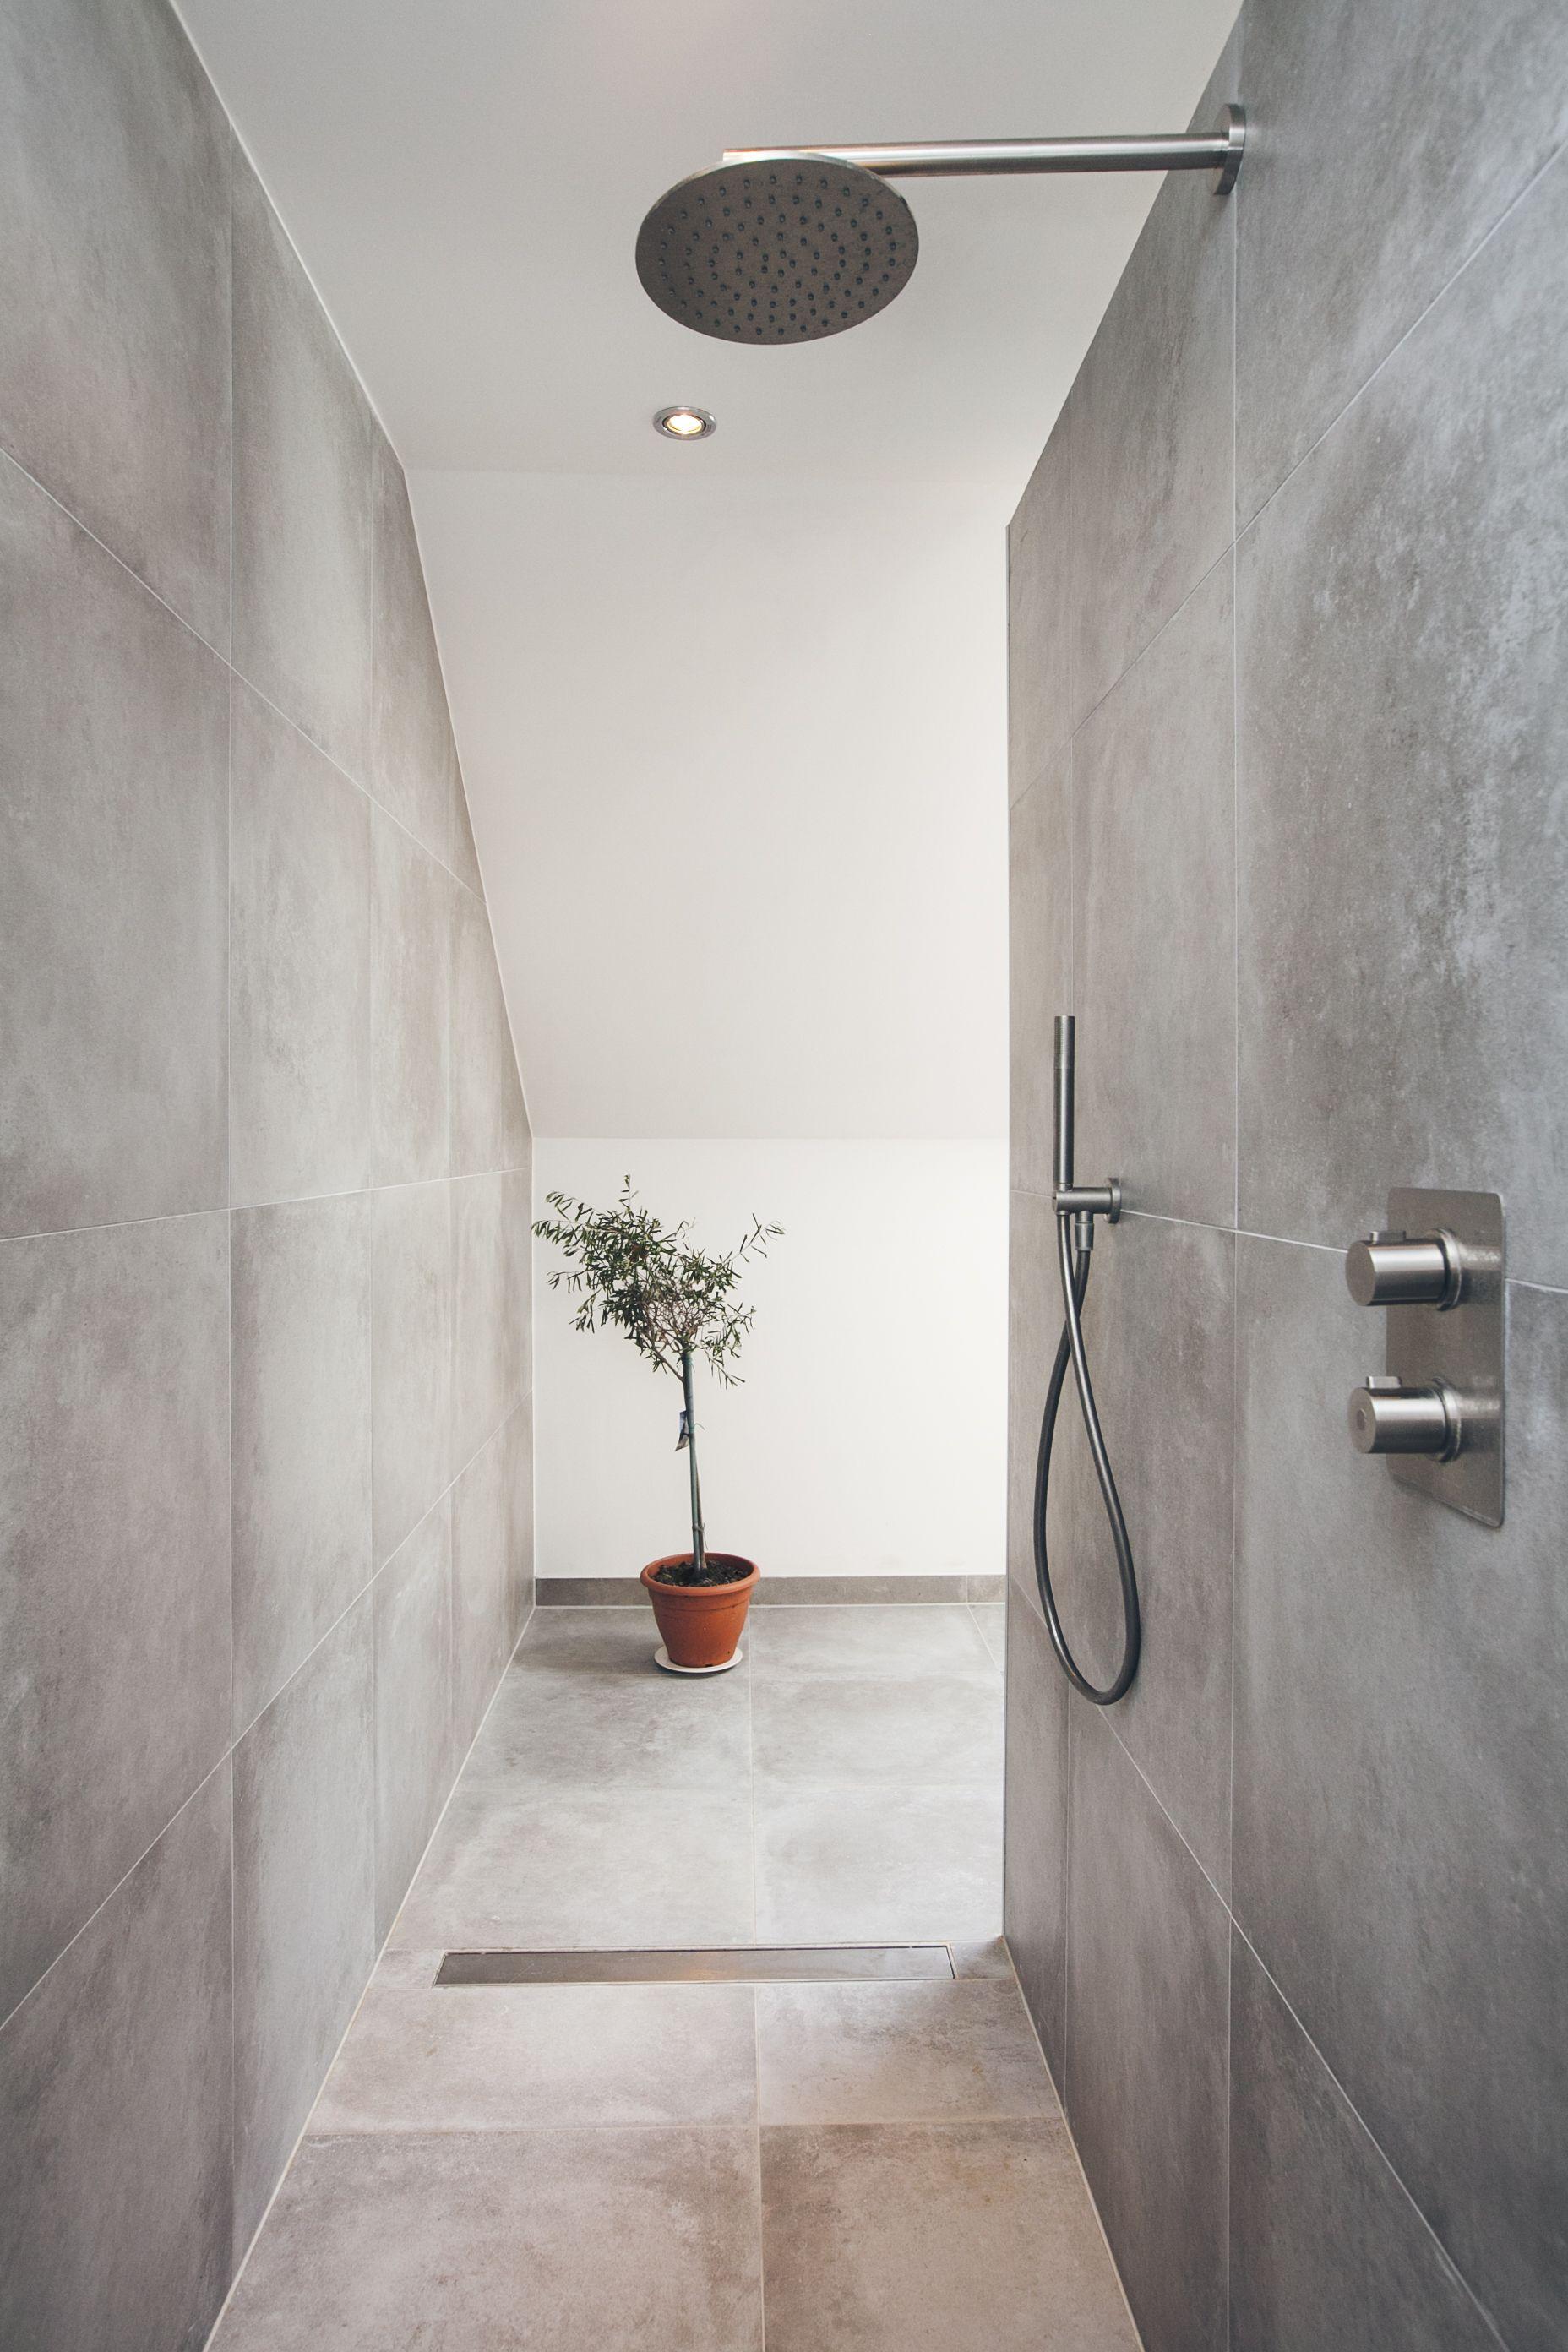 Bathroom Goals | Bathrooms | Pinterest | Goal, Ensuite bathrooms and ...